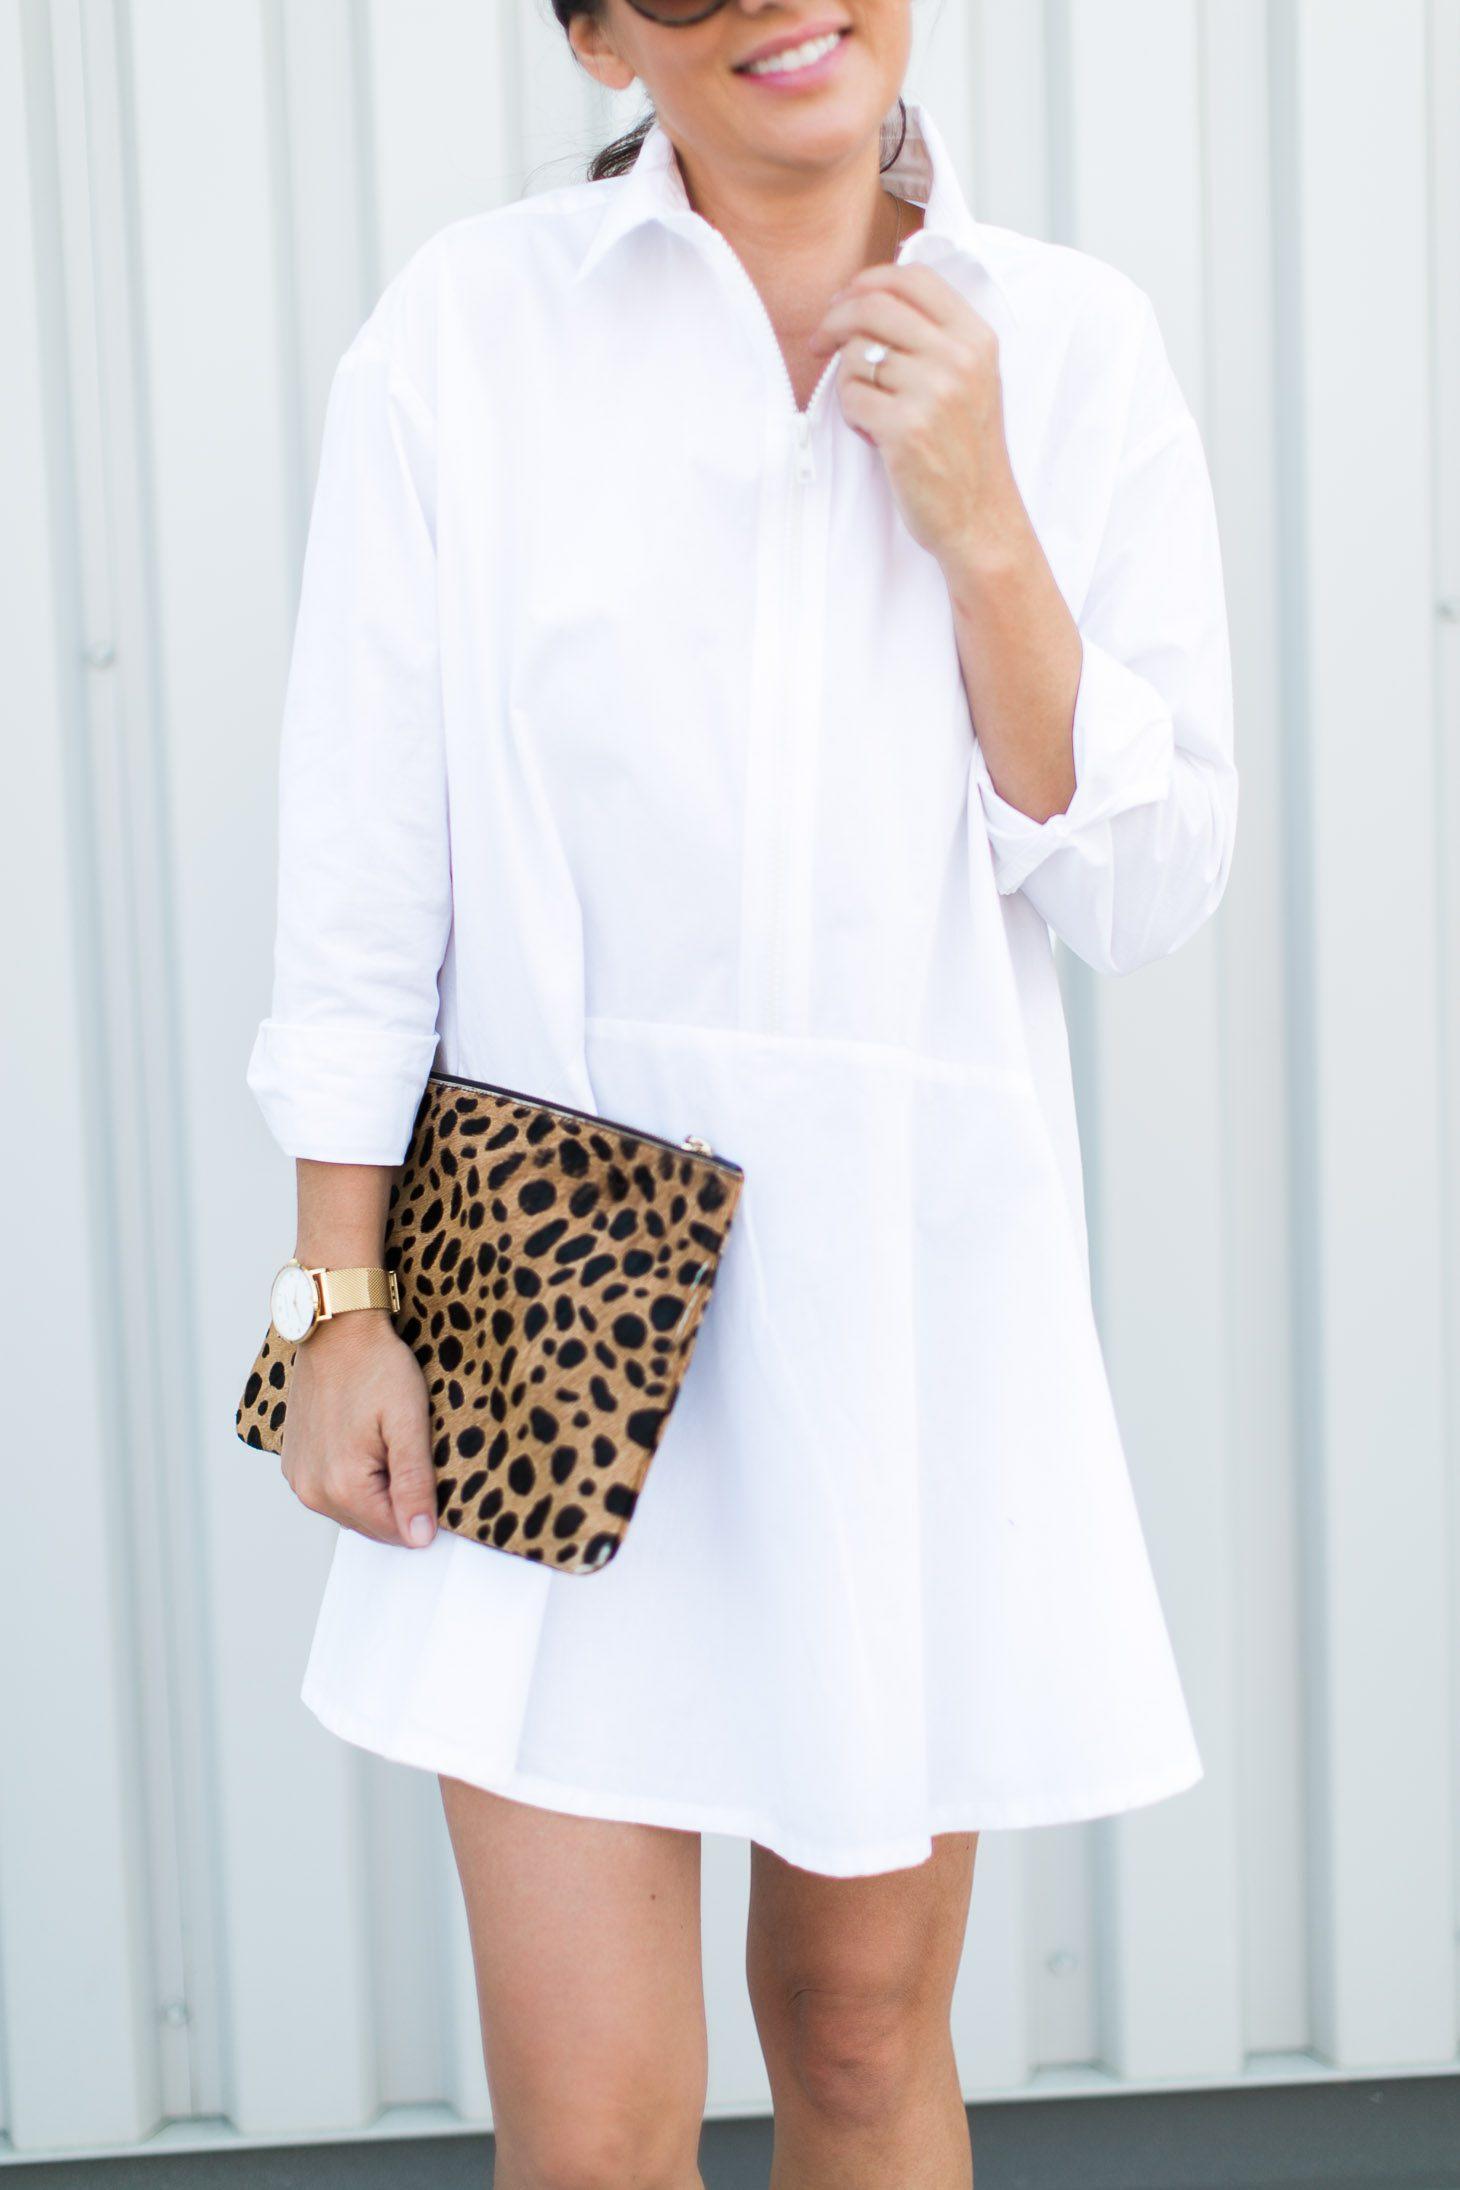 Jillian Harris Urban Outfitters White Dress